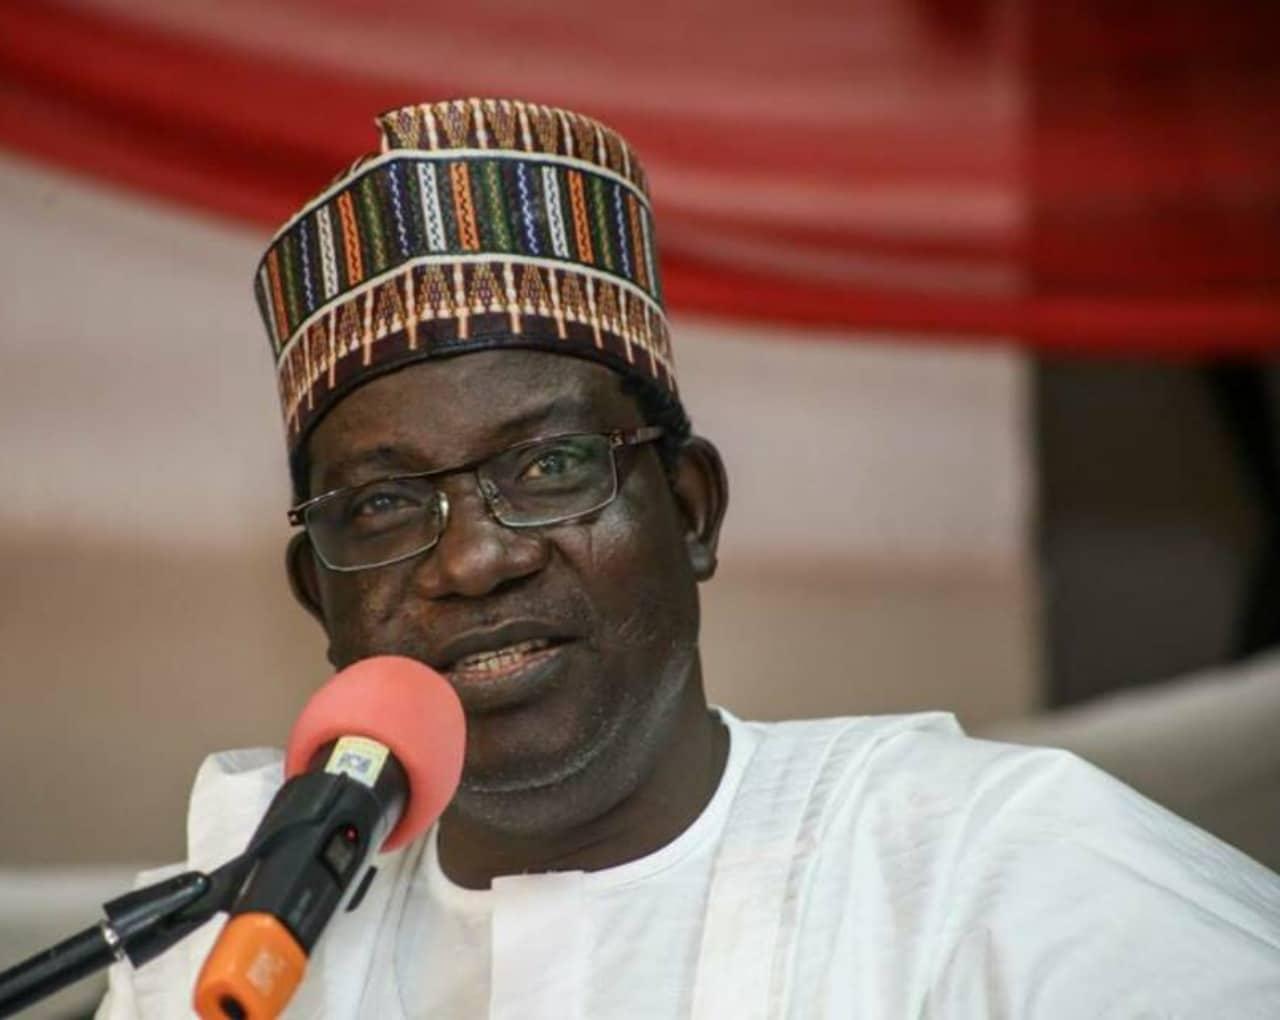 Nigeria news : Gov Lalong slams ASUU over Plateau University strike